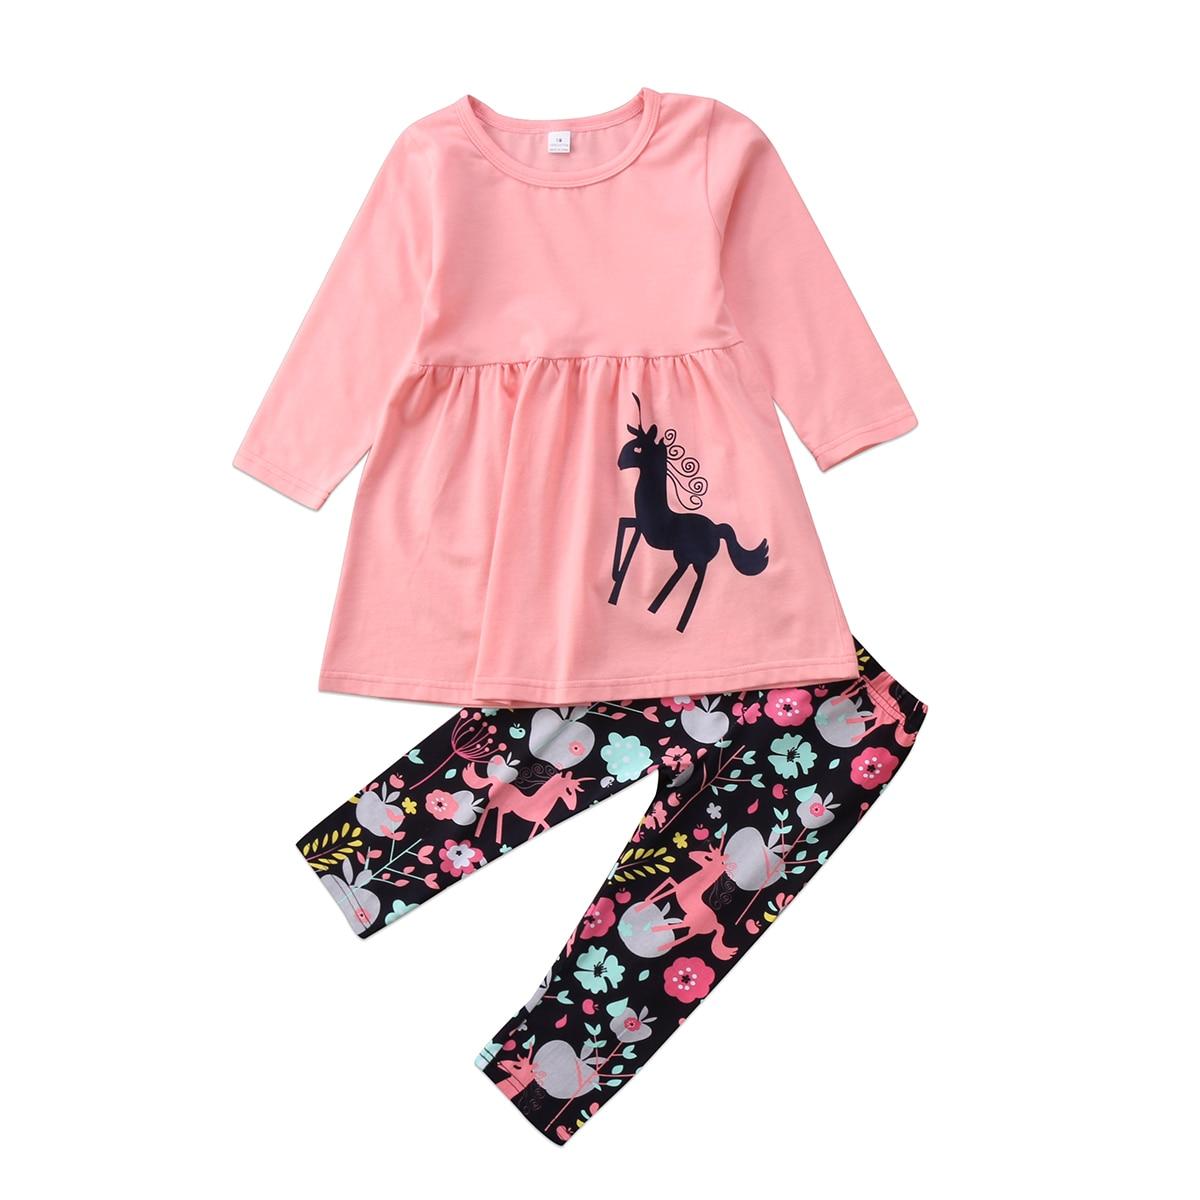 Toddler Girls Kids Dress Princess Winter Autumn Toddler Floral Dress Cute Infant Unicorn Tops Dress+pants Outfits Clothes Set Girls' Clothing